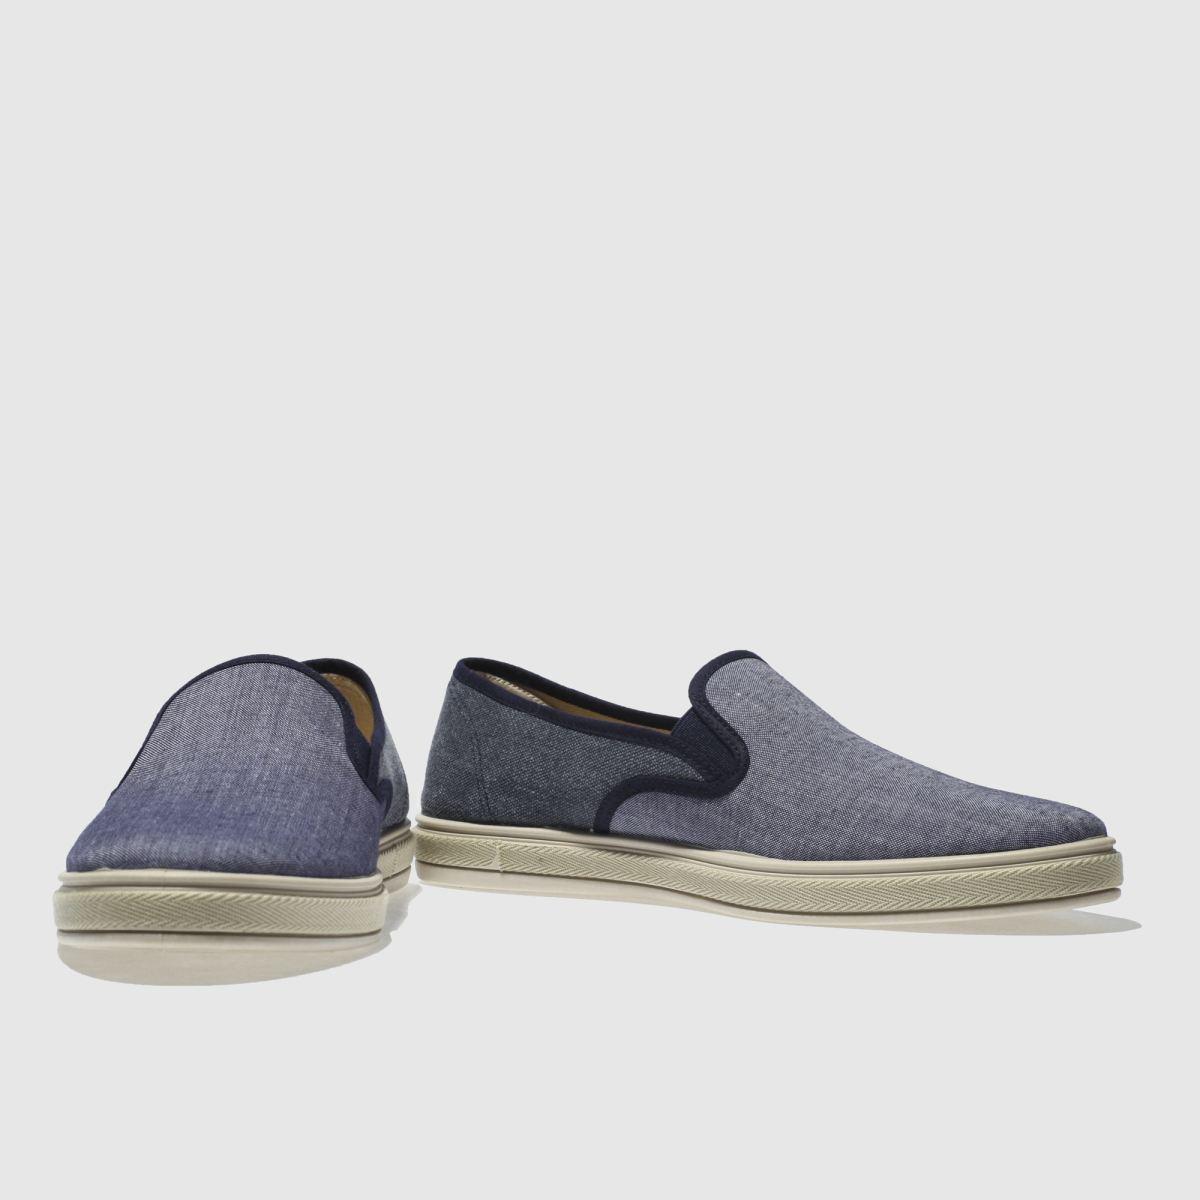 Herren Marineblau Cruz red or dead Mr Cruz Marineblau Slip Schuhe   schuh Gute Qualität beliebte Schuhe 1a6f8c